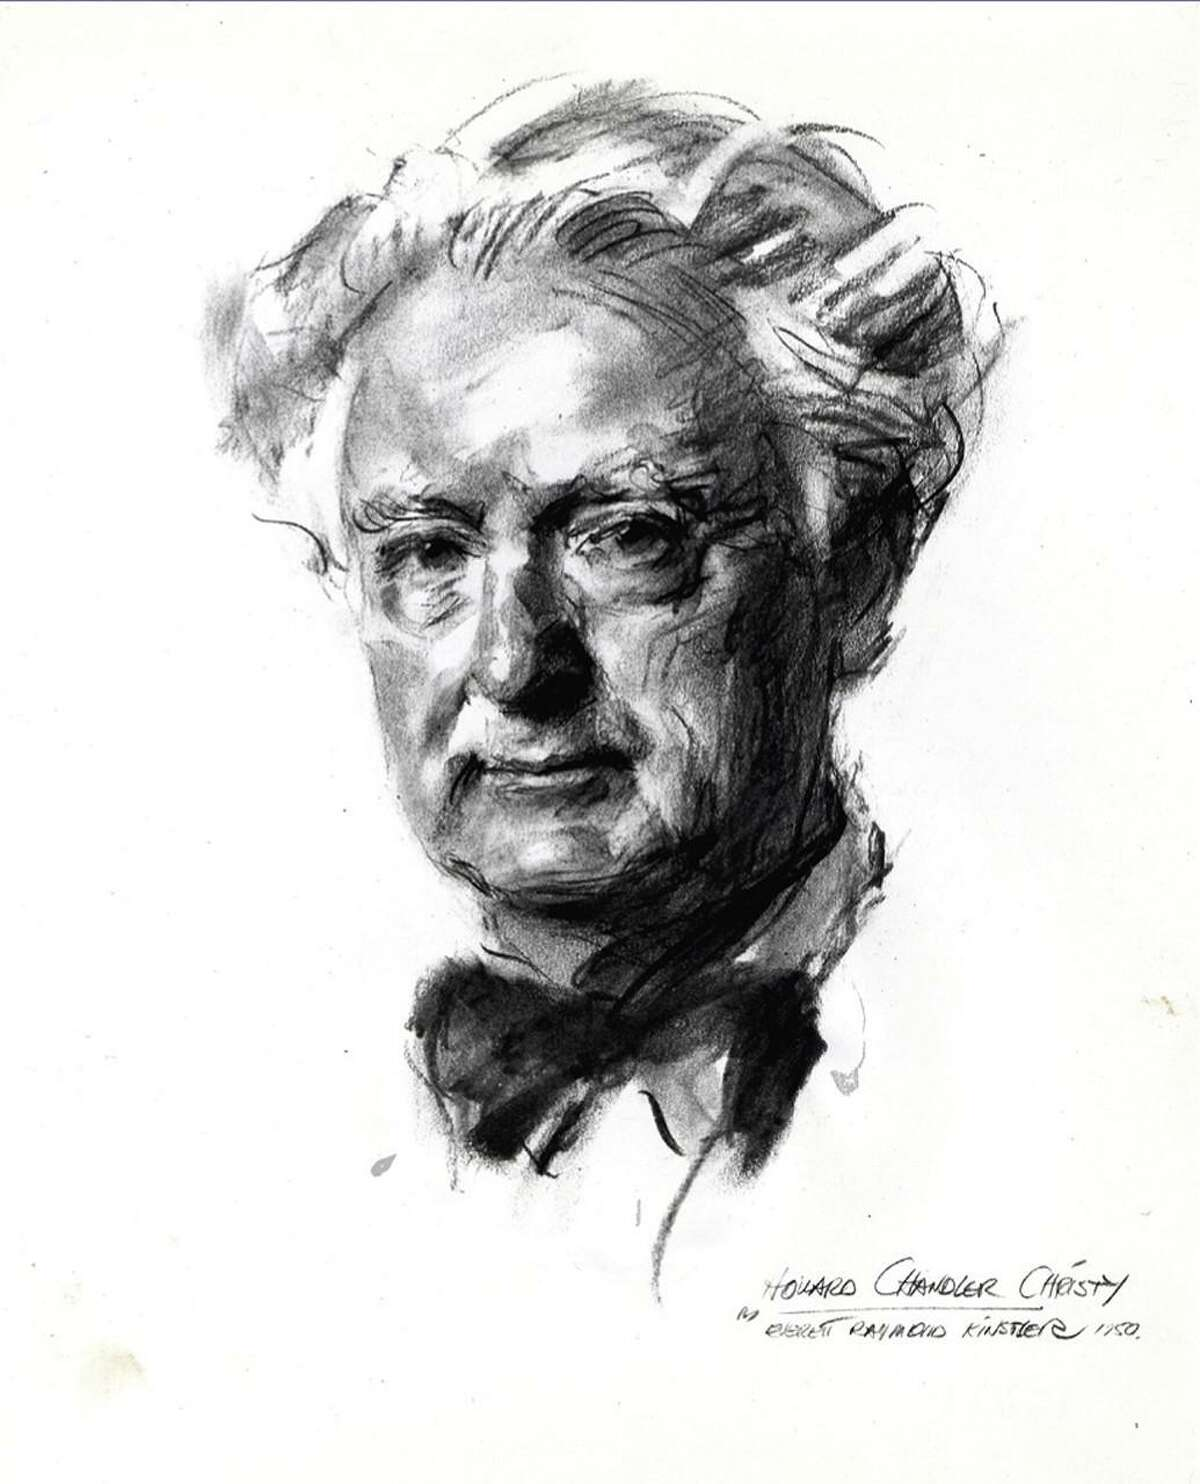 A sketch of artist Howard Chandler Christy done by artist Everett Raymond Kinstler.